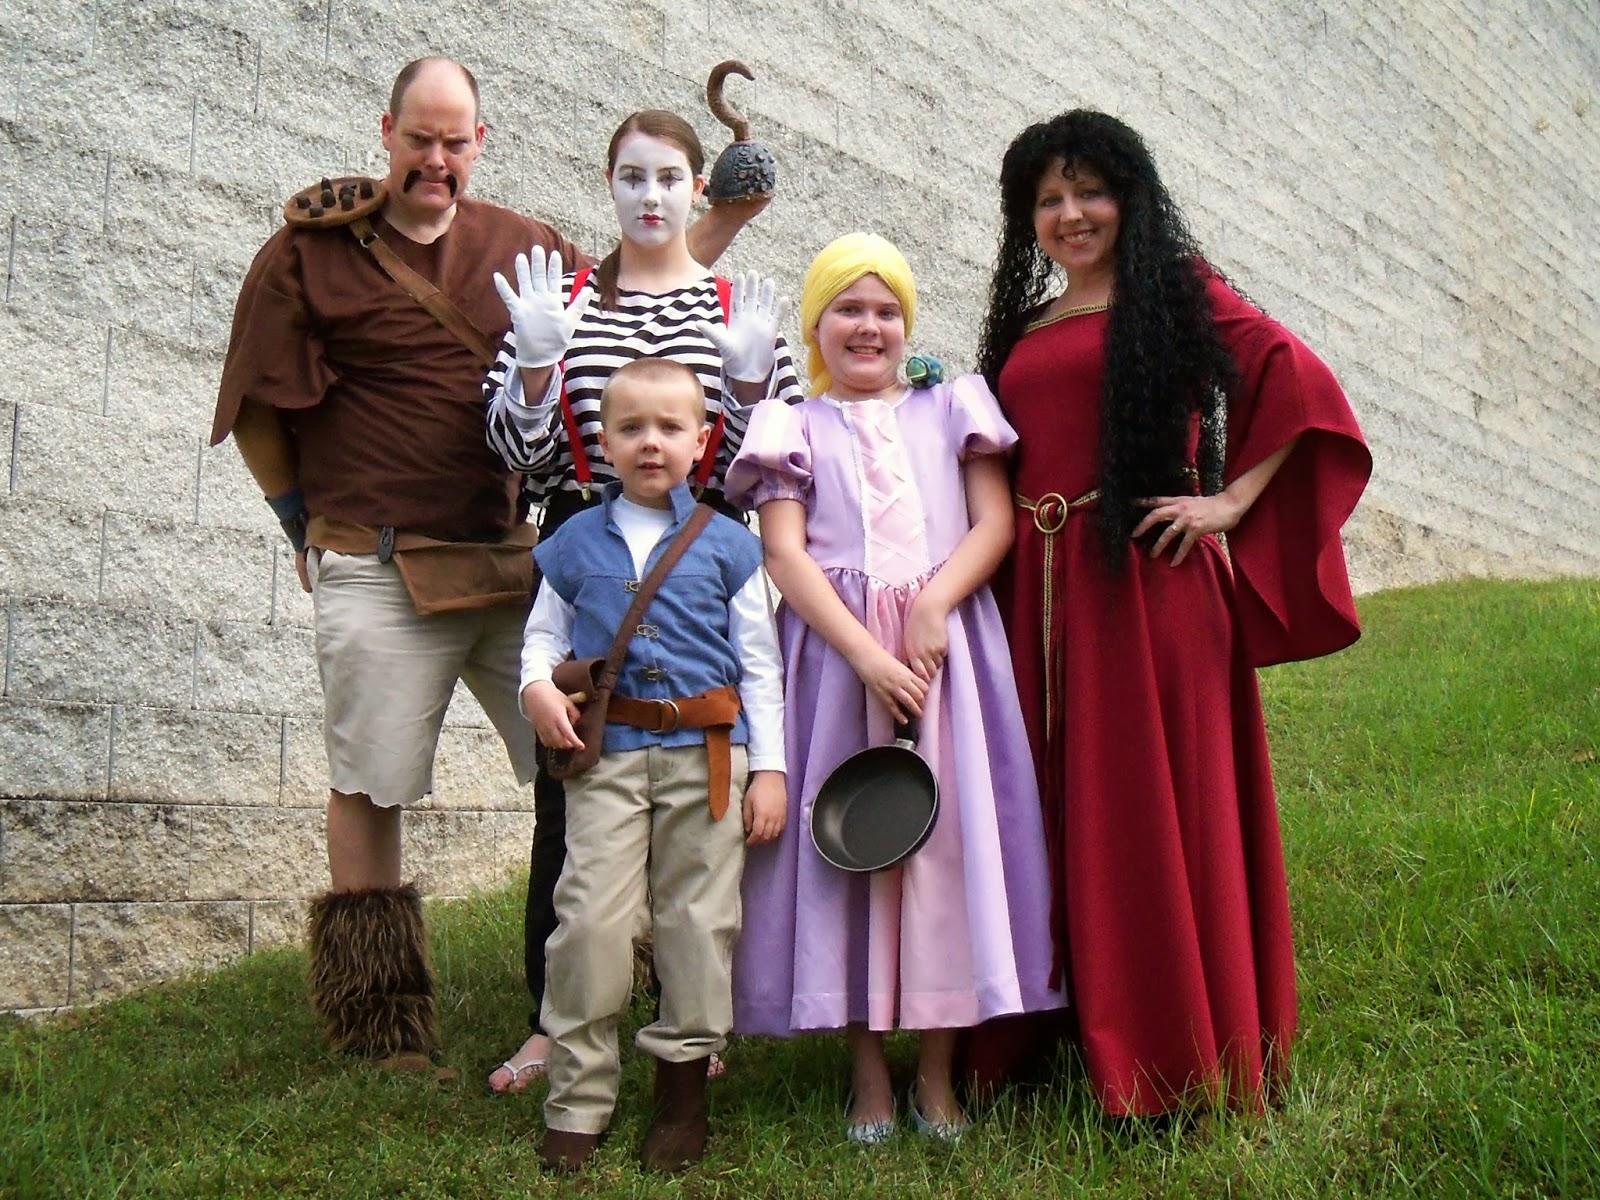 Tangled Family Halloween Costumes  sc 1 st  Bird On A Cake & Bird On A Cake: Tangled Family Halloween Costumes